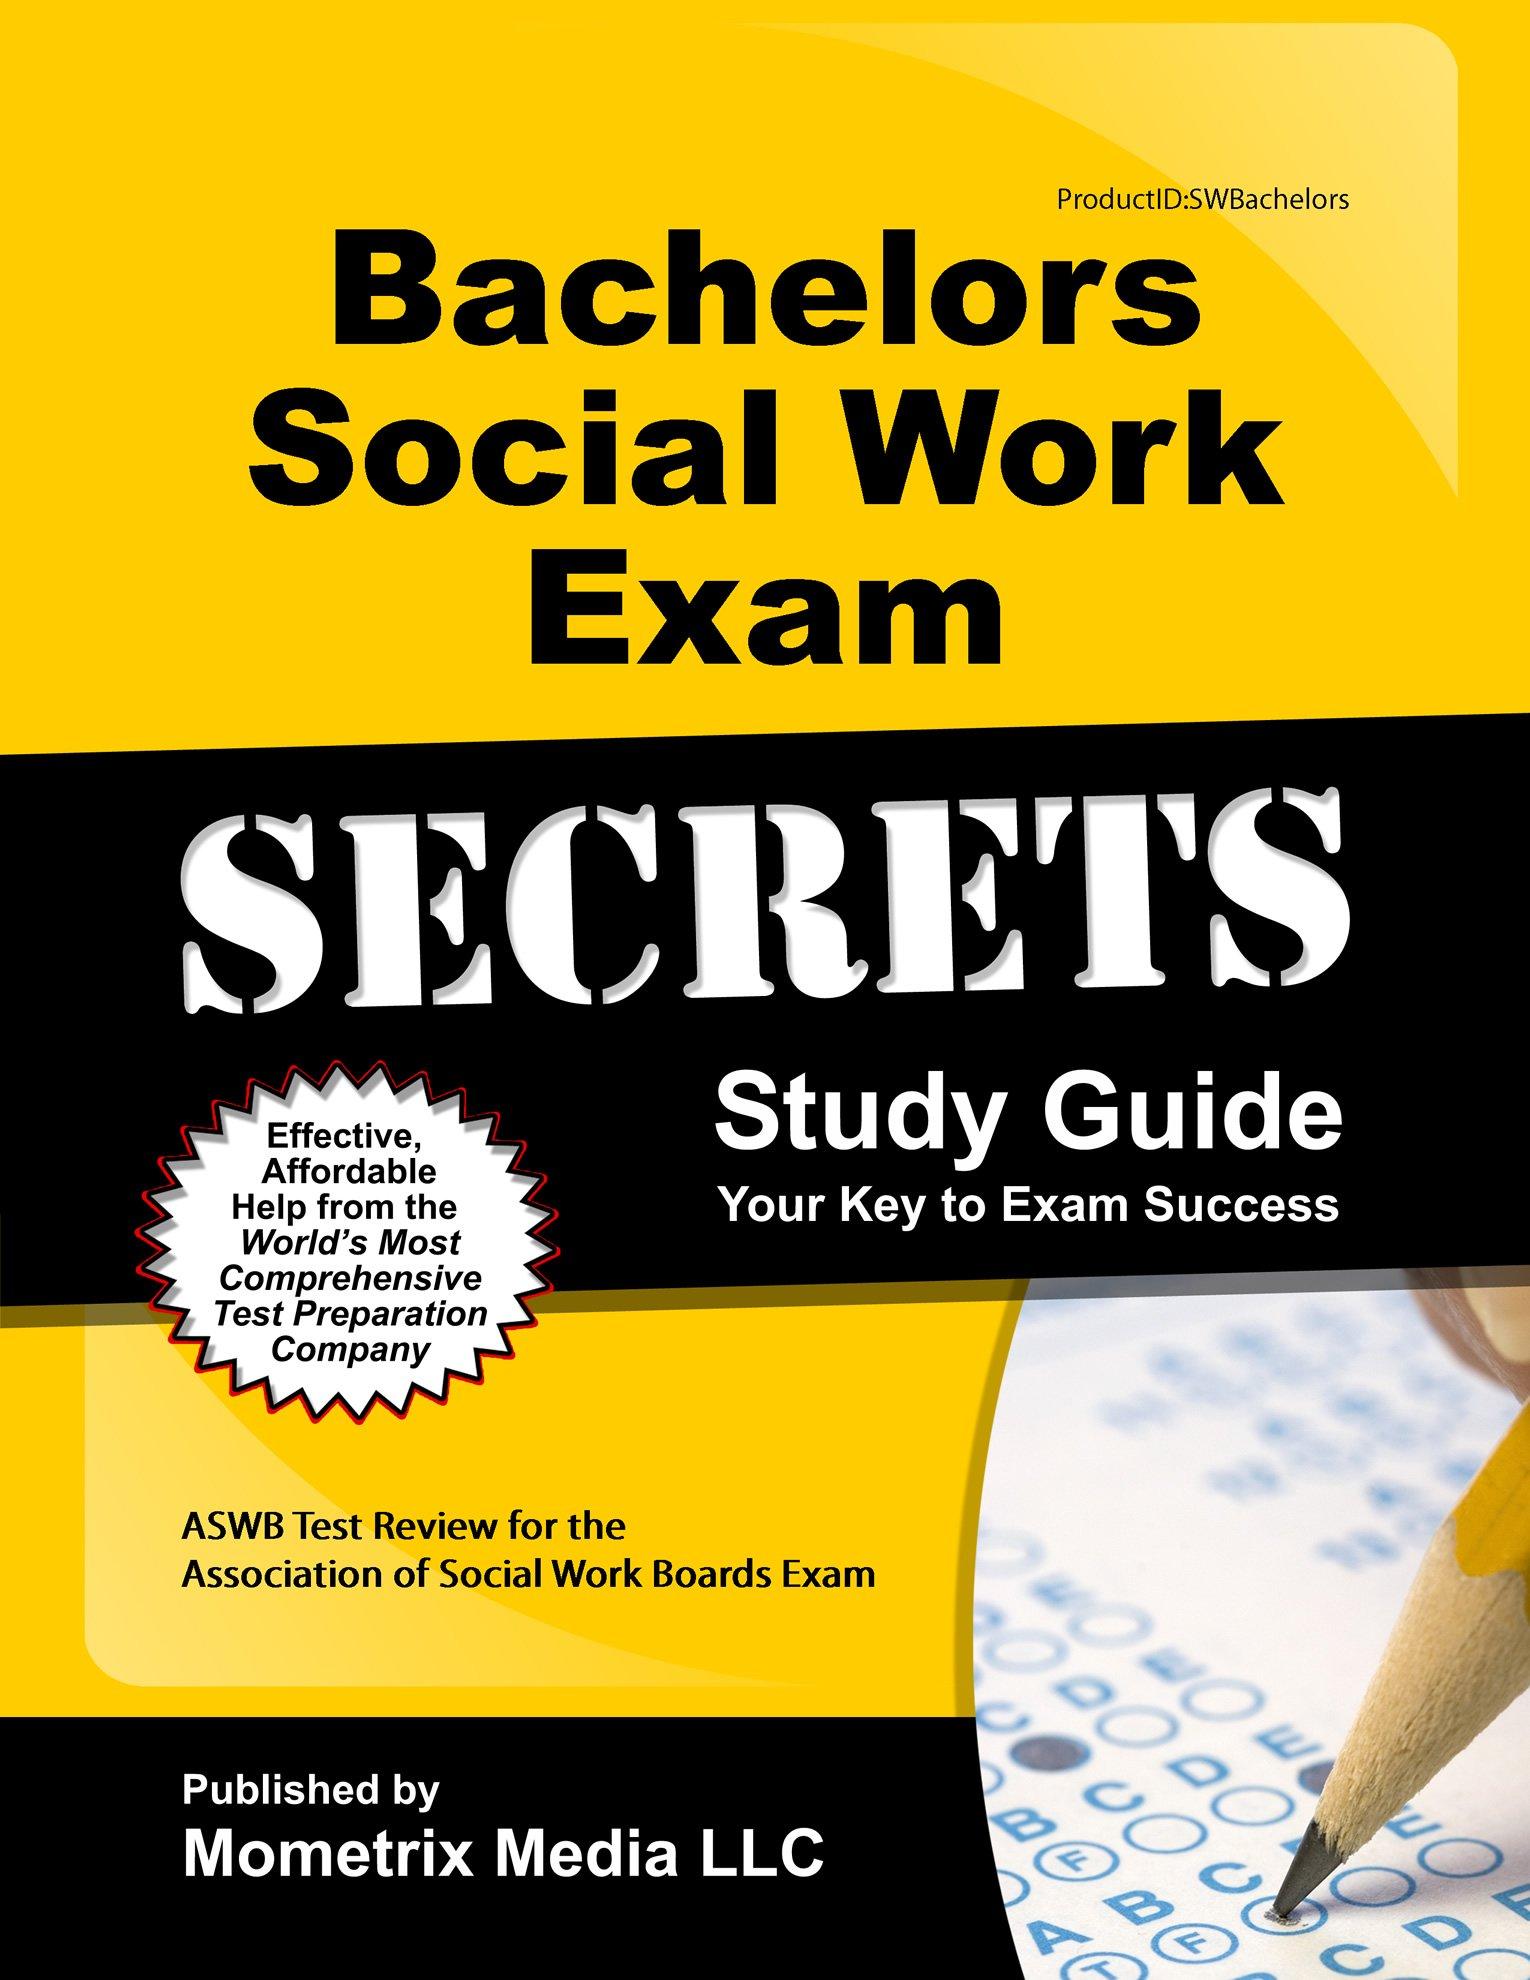 Buy social work aswb masters exam guide: a comprehensive study.